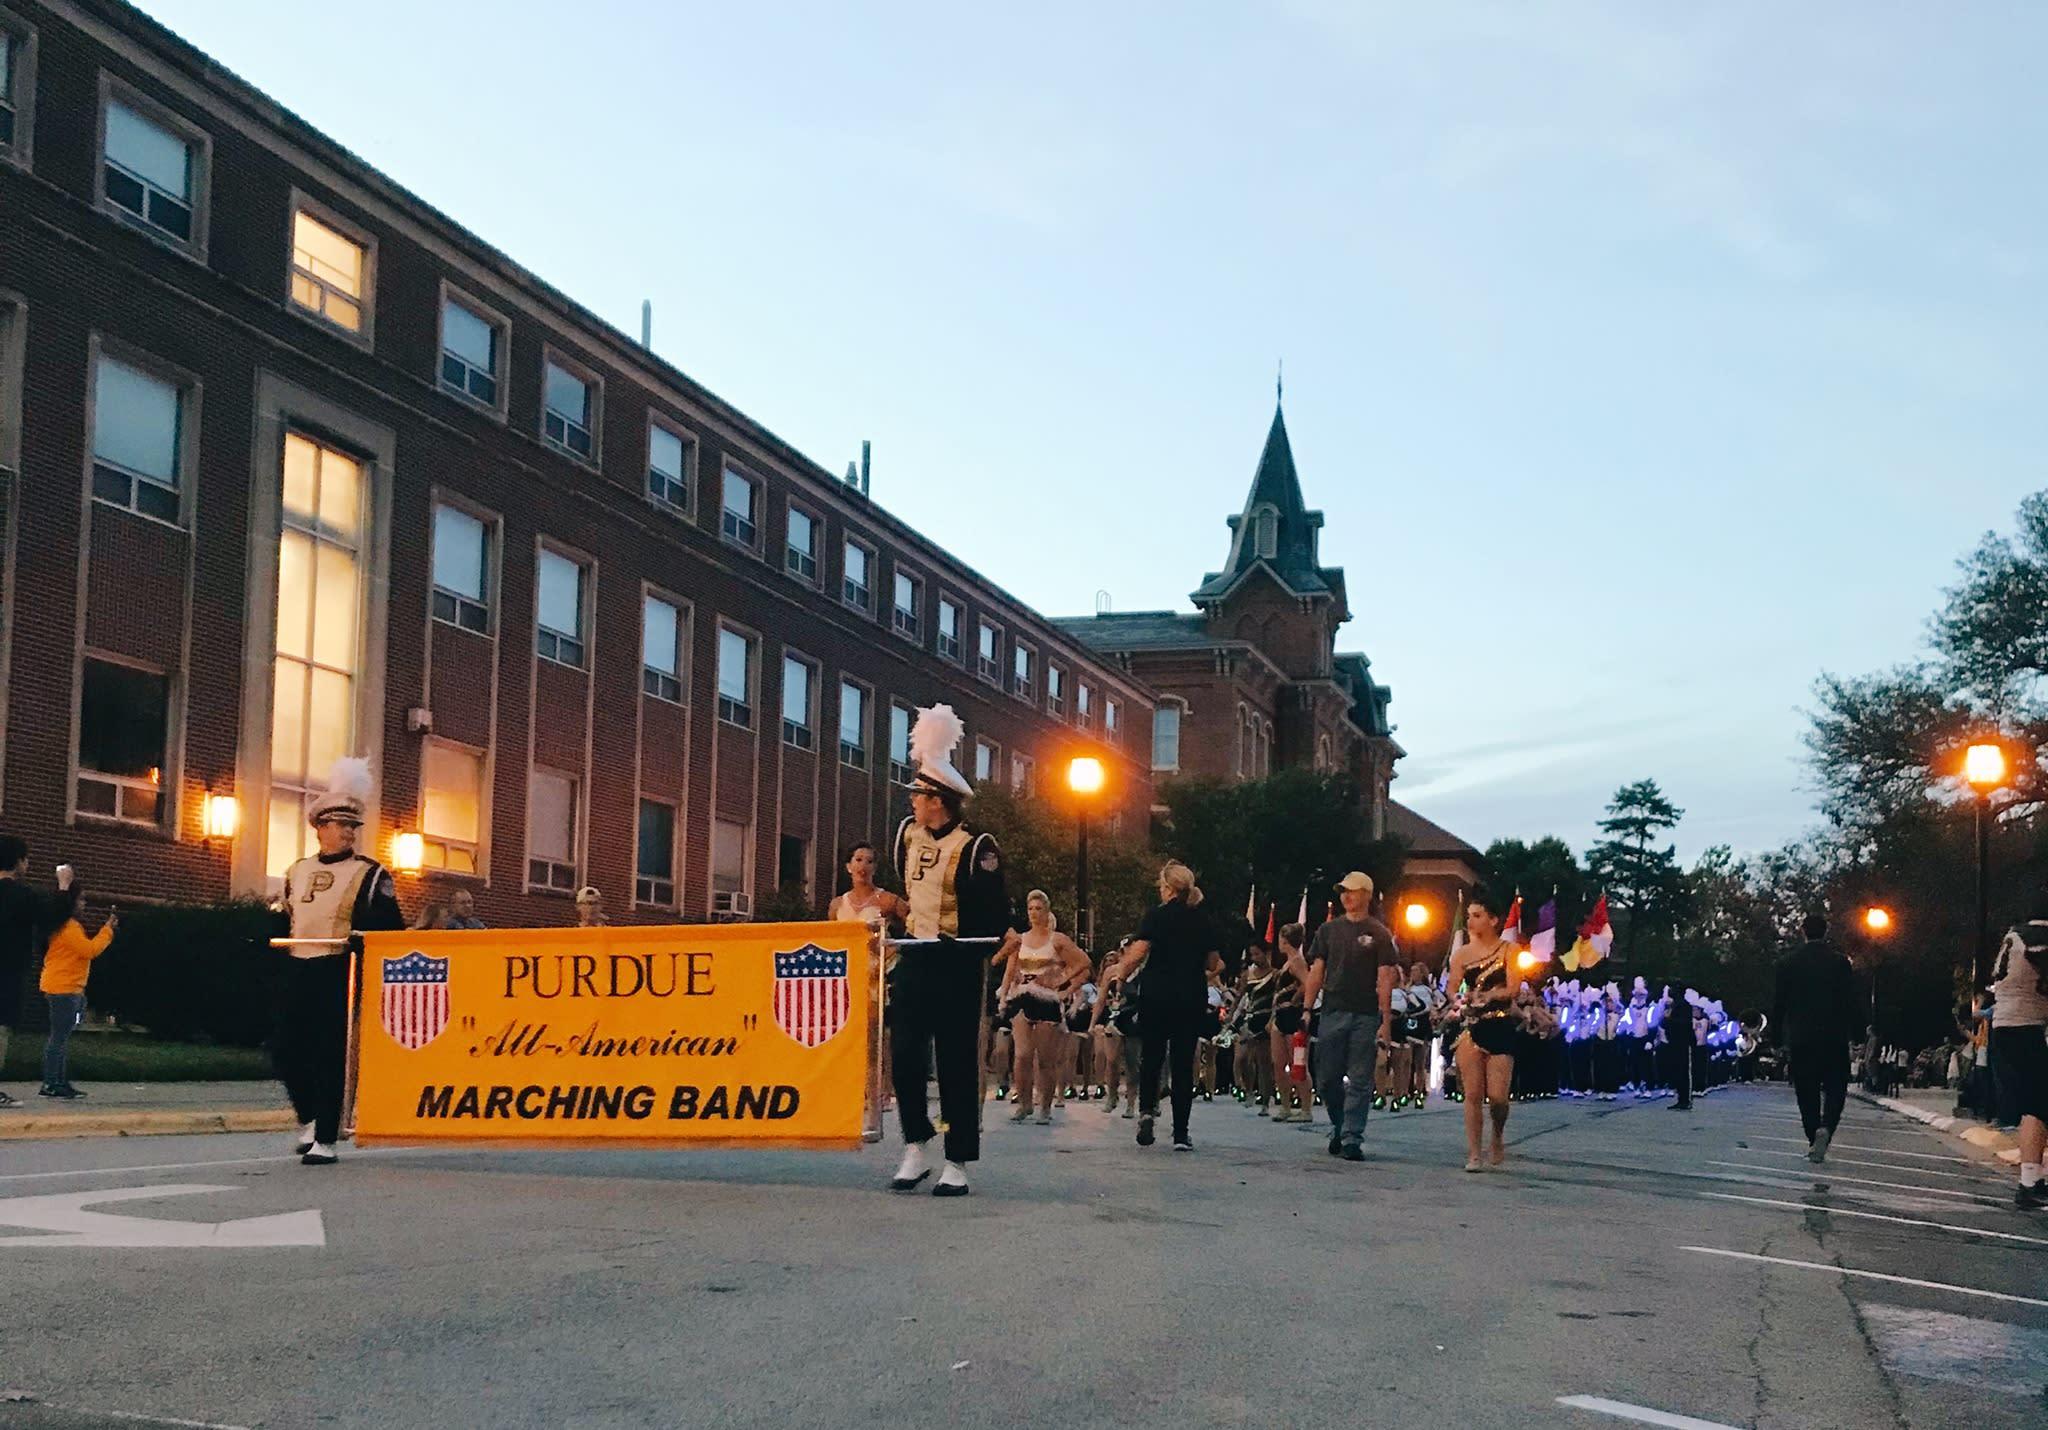 Purdue Homecoming Parade